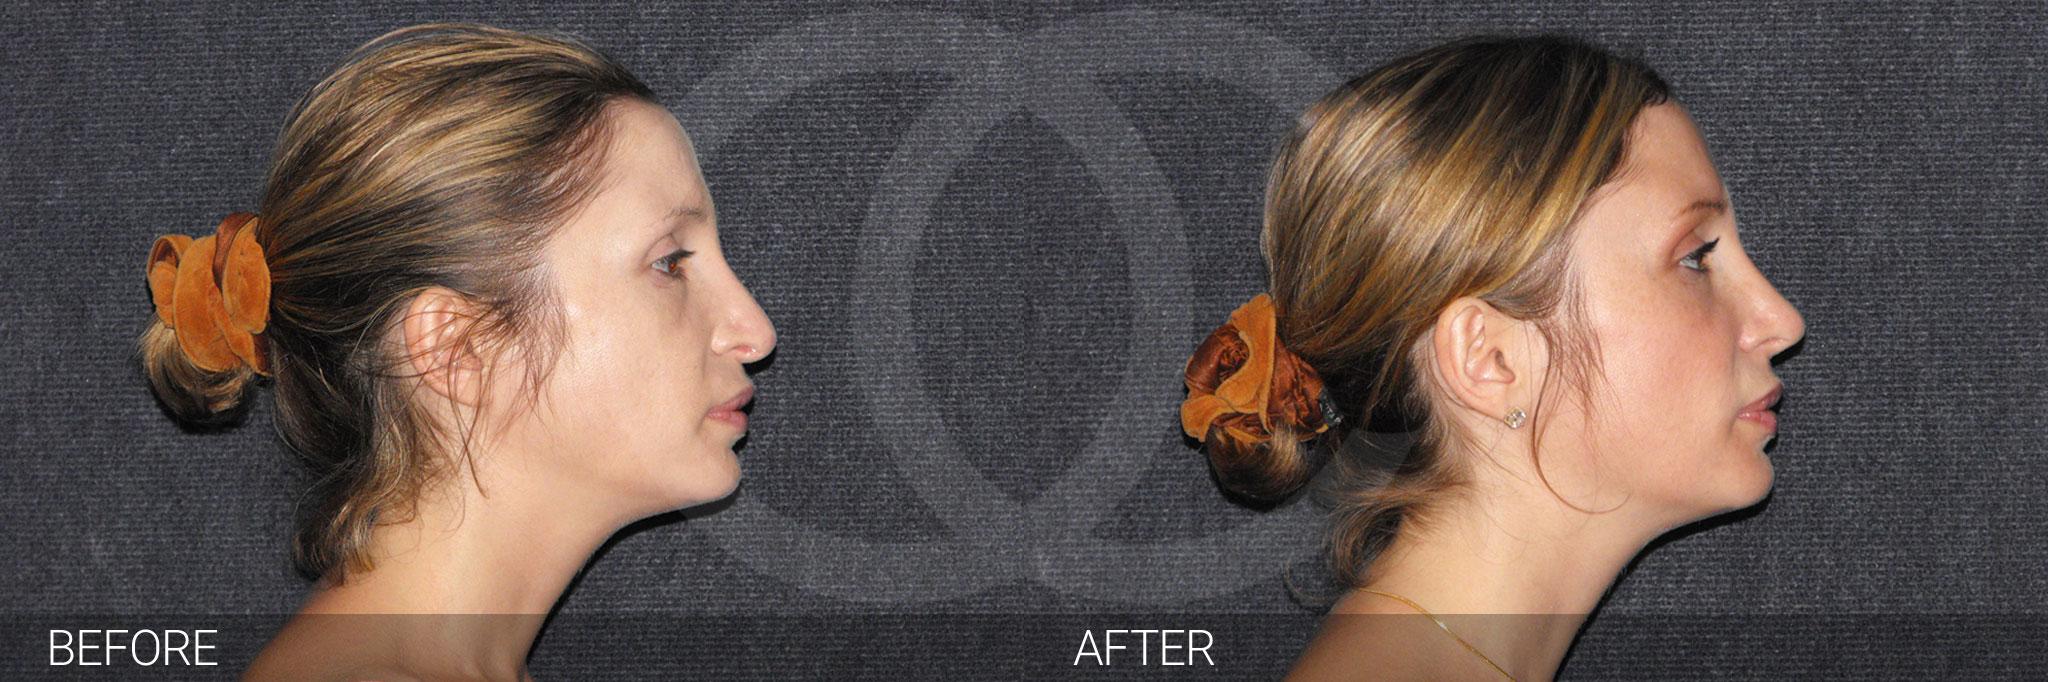 Chirurgie du nez 04 ante/post-op III